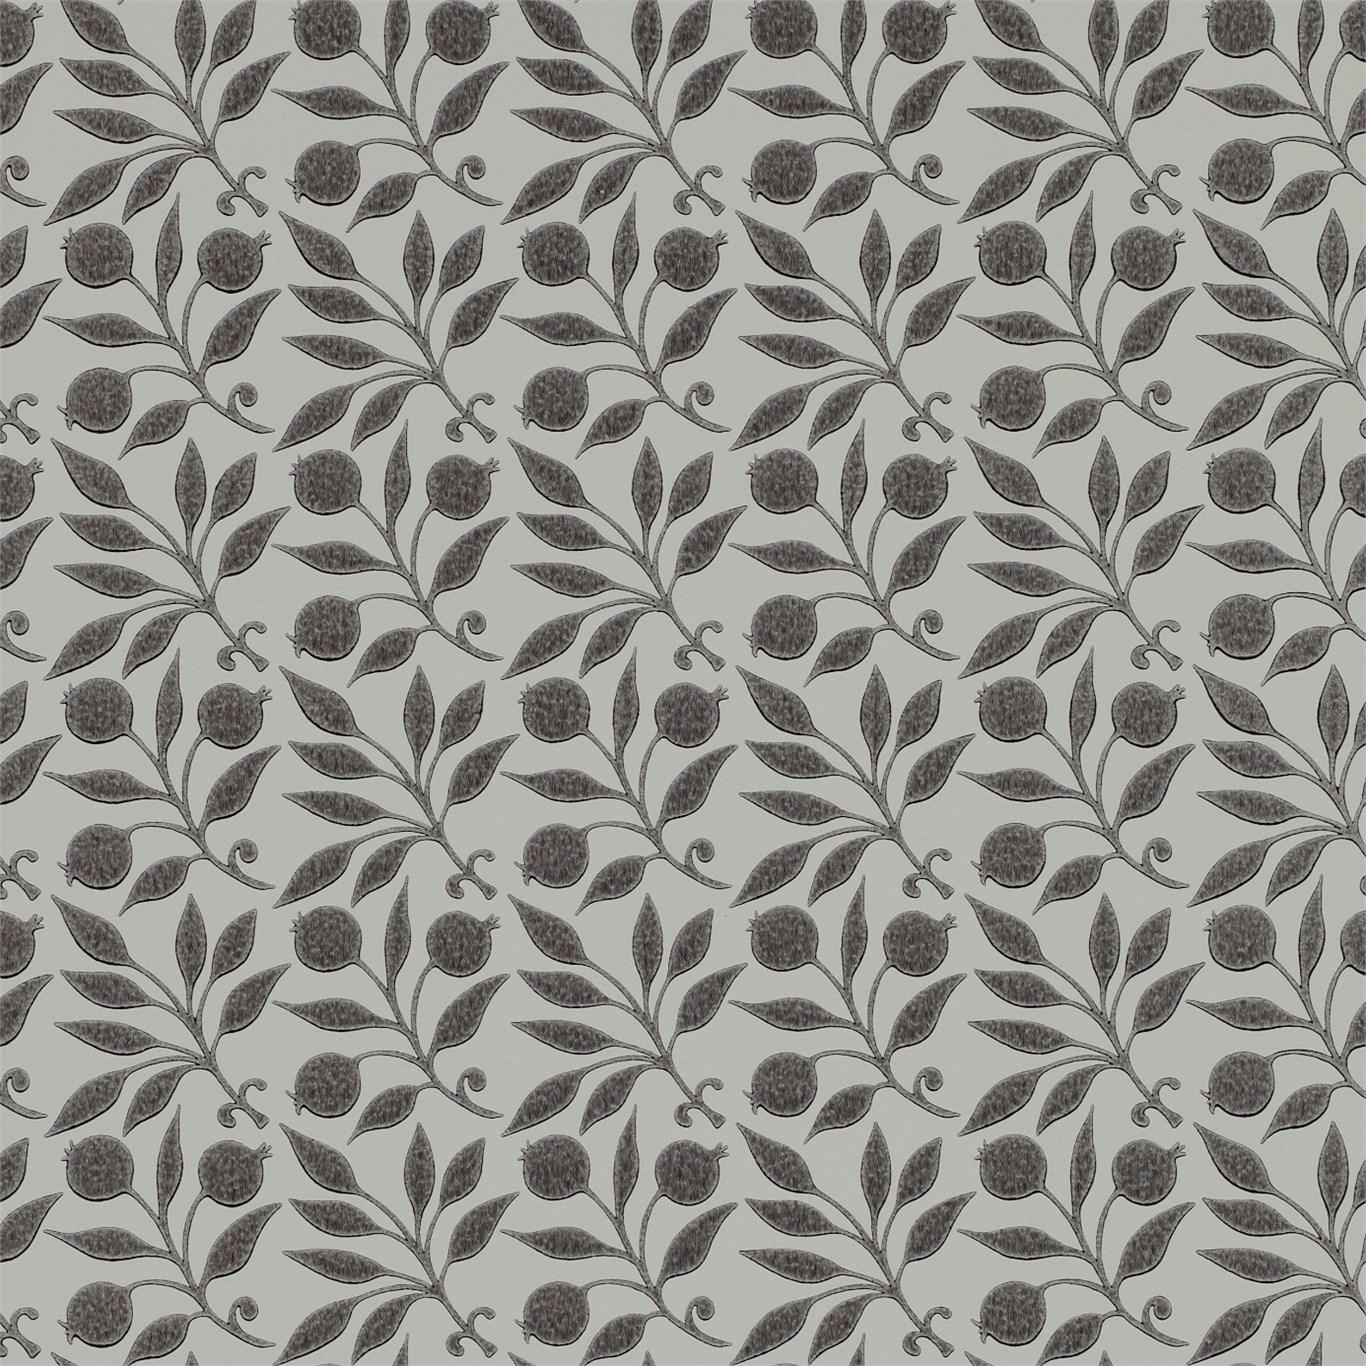 Image of Morris & Co Rosehip Black Wallpaper 214706